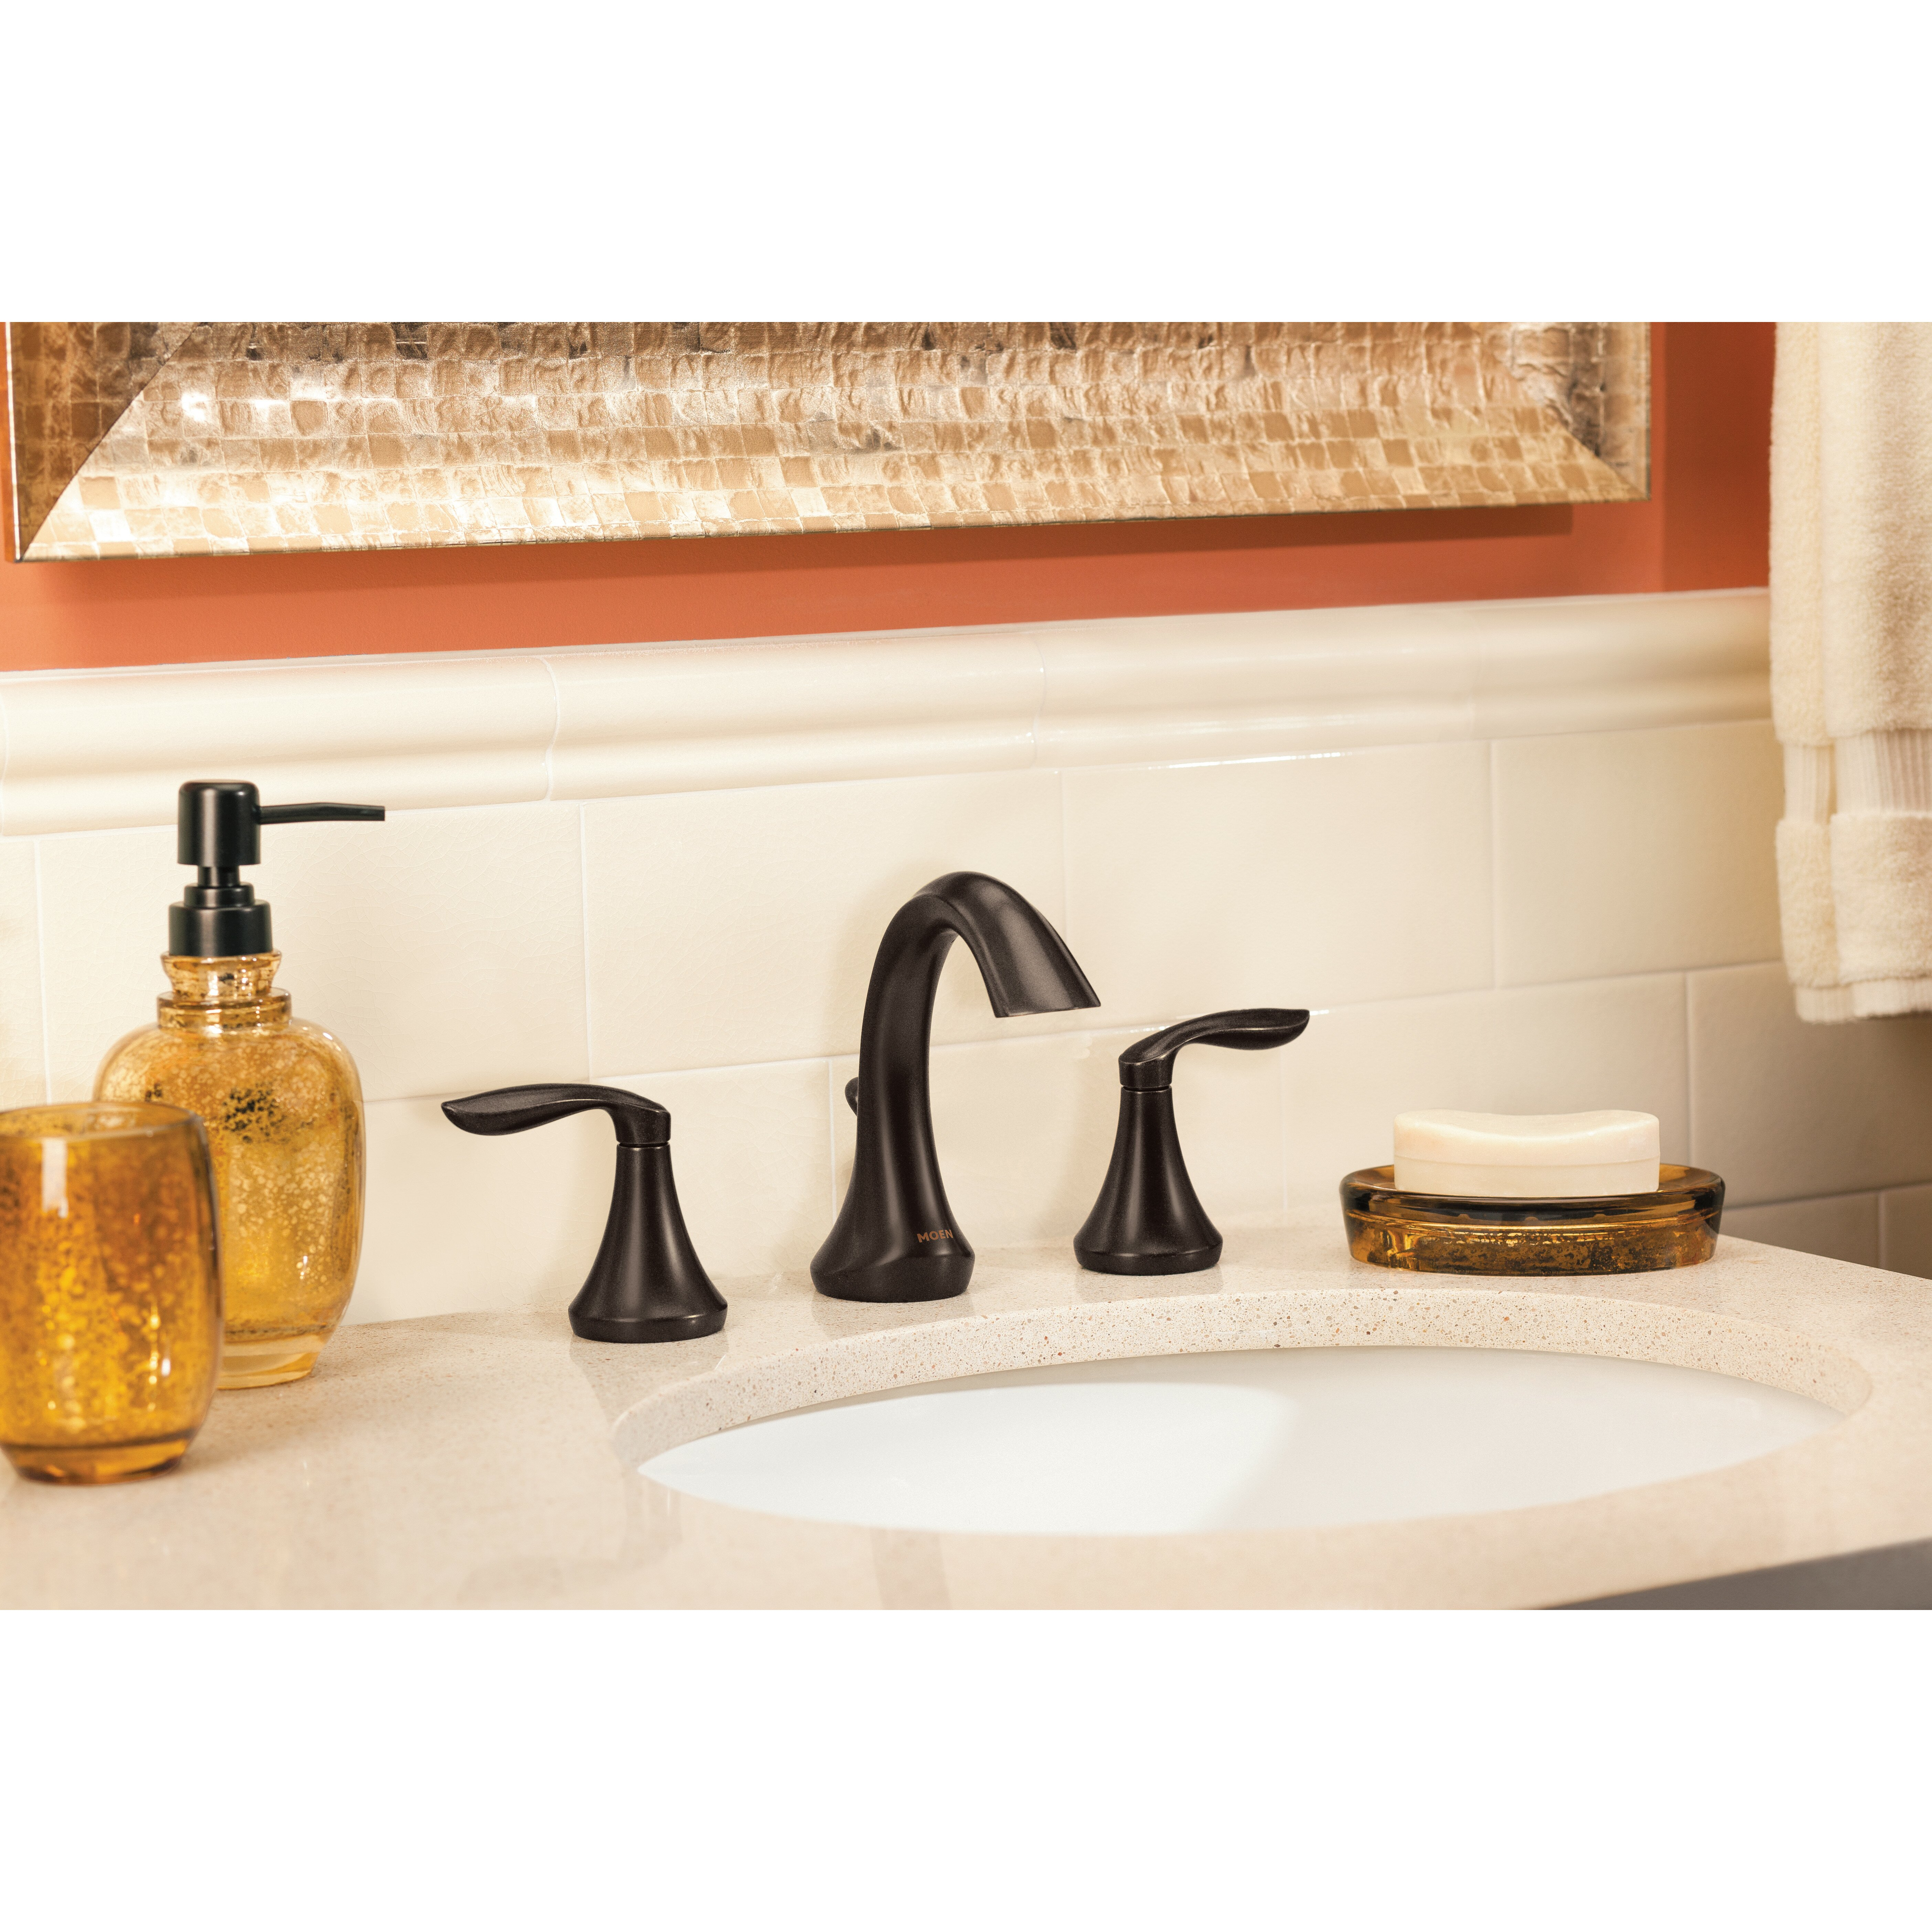 Moen Eva Double Handle Widespread Bathroom Faucet Reviews Wayfair Supply